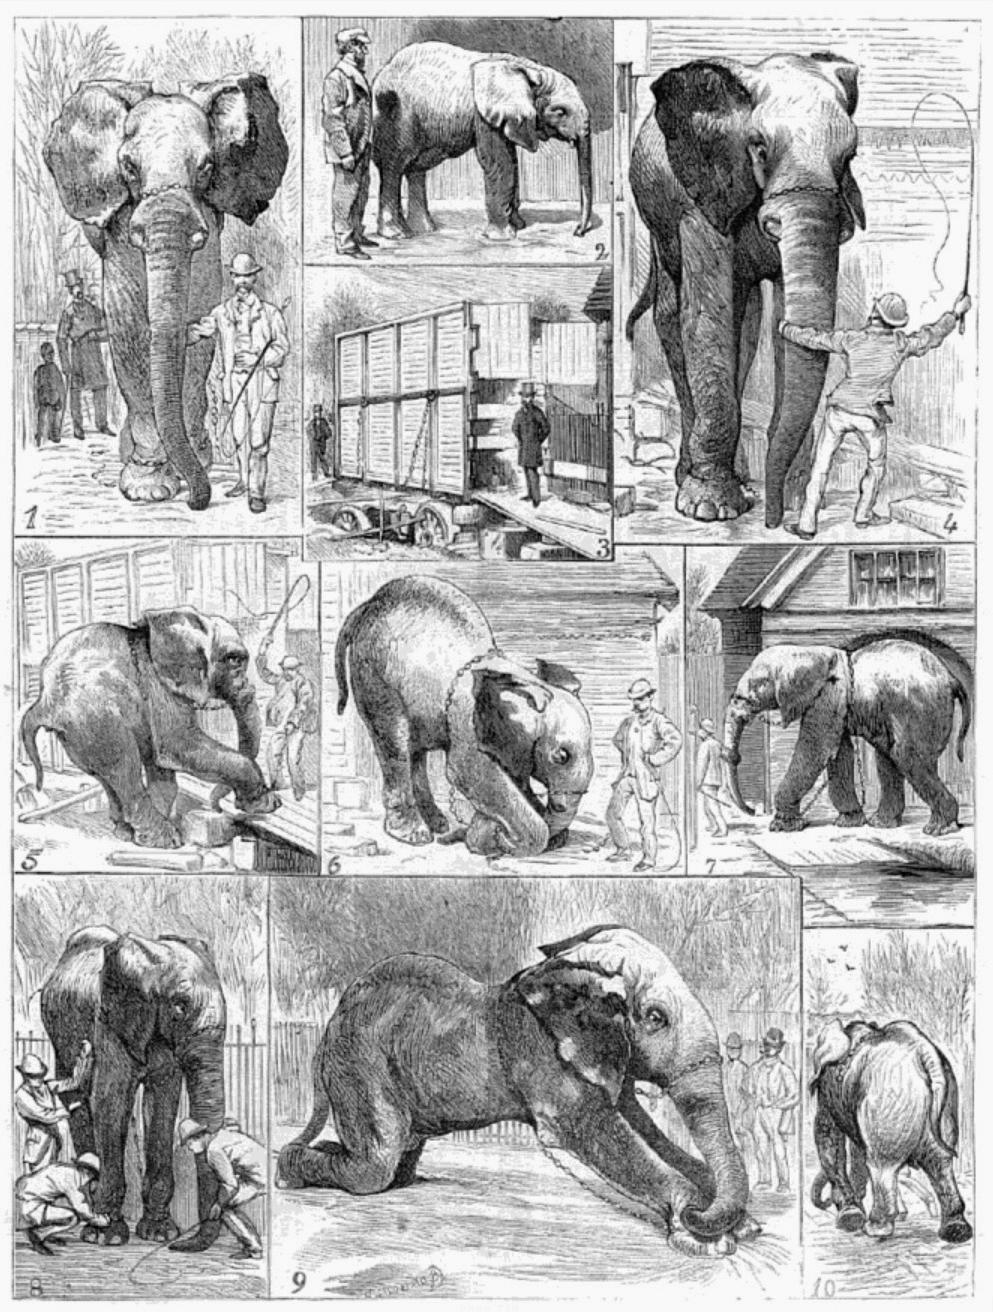 Jumbo Elephant Png : Jumbo_the_elephant.png (16 × 16 pixels, file size: